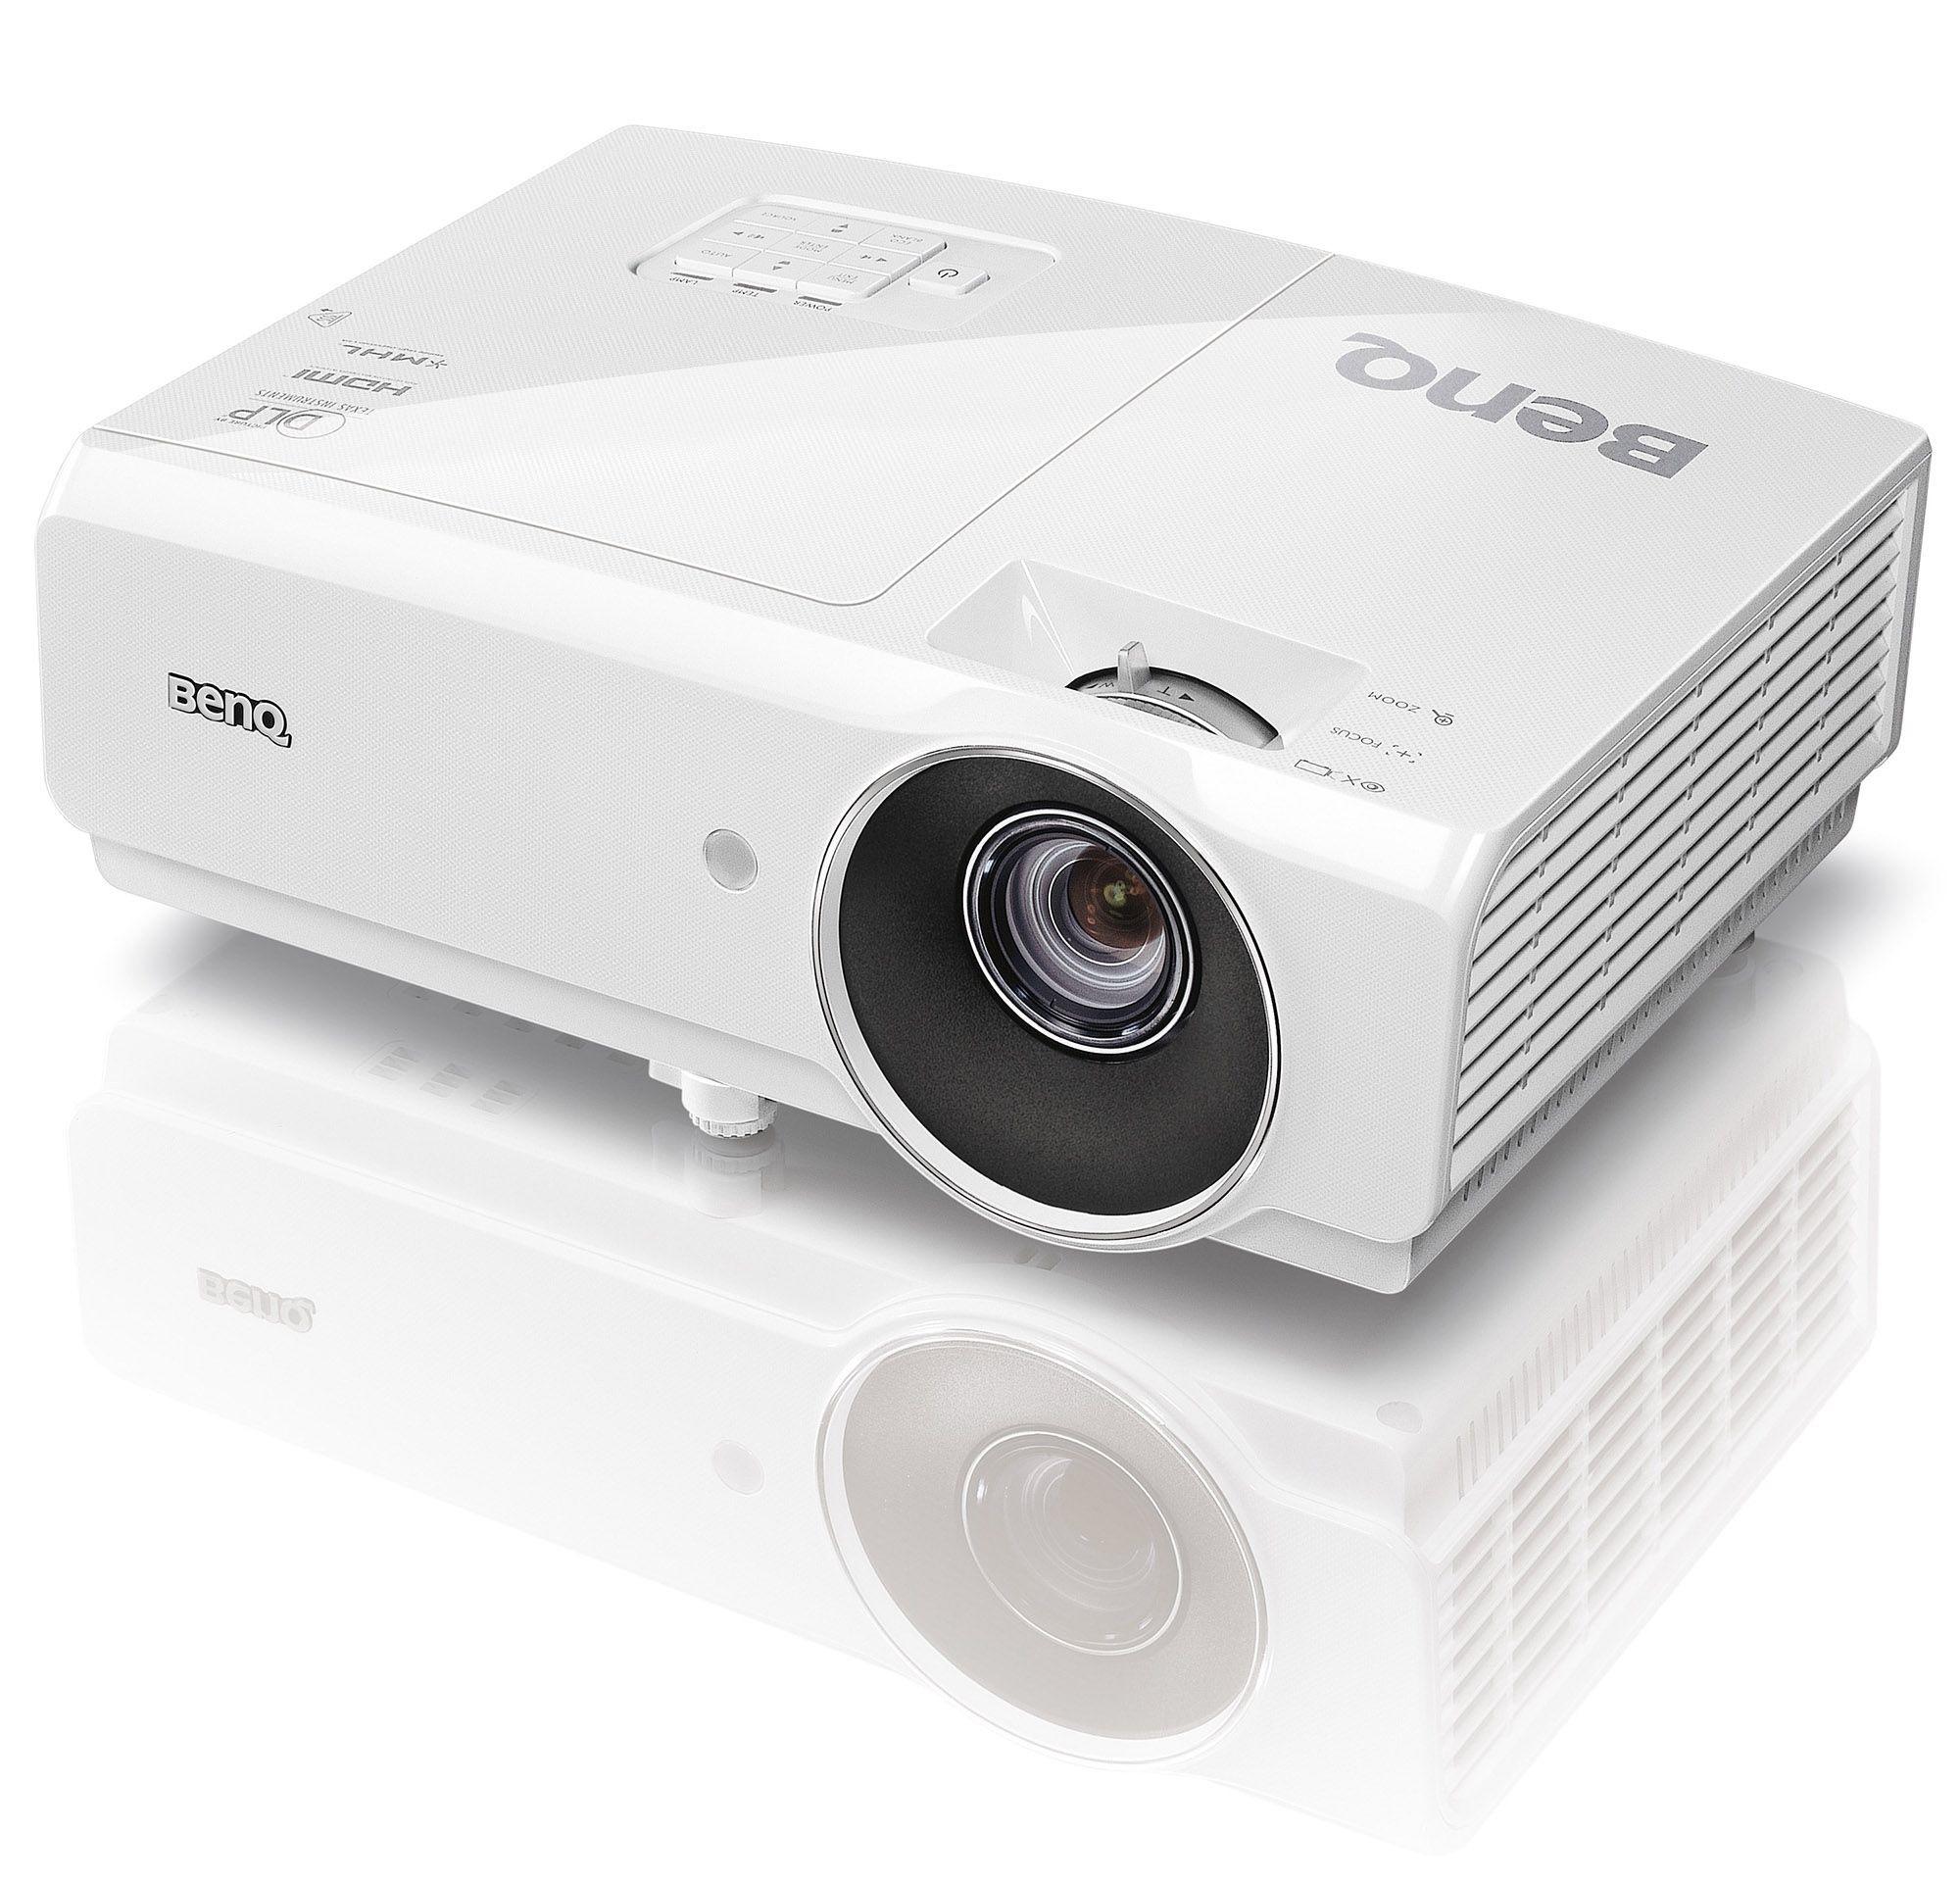 Descriere Videoproiector BENQ MH684, Full HD, 3D, 3500 lumeni, HDMI